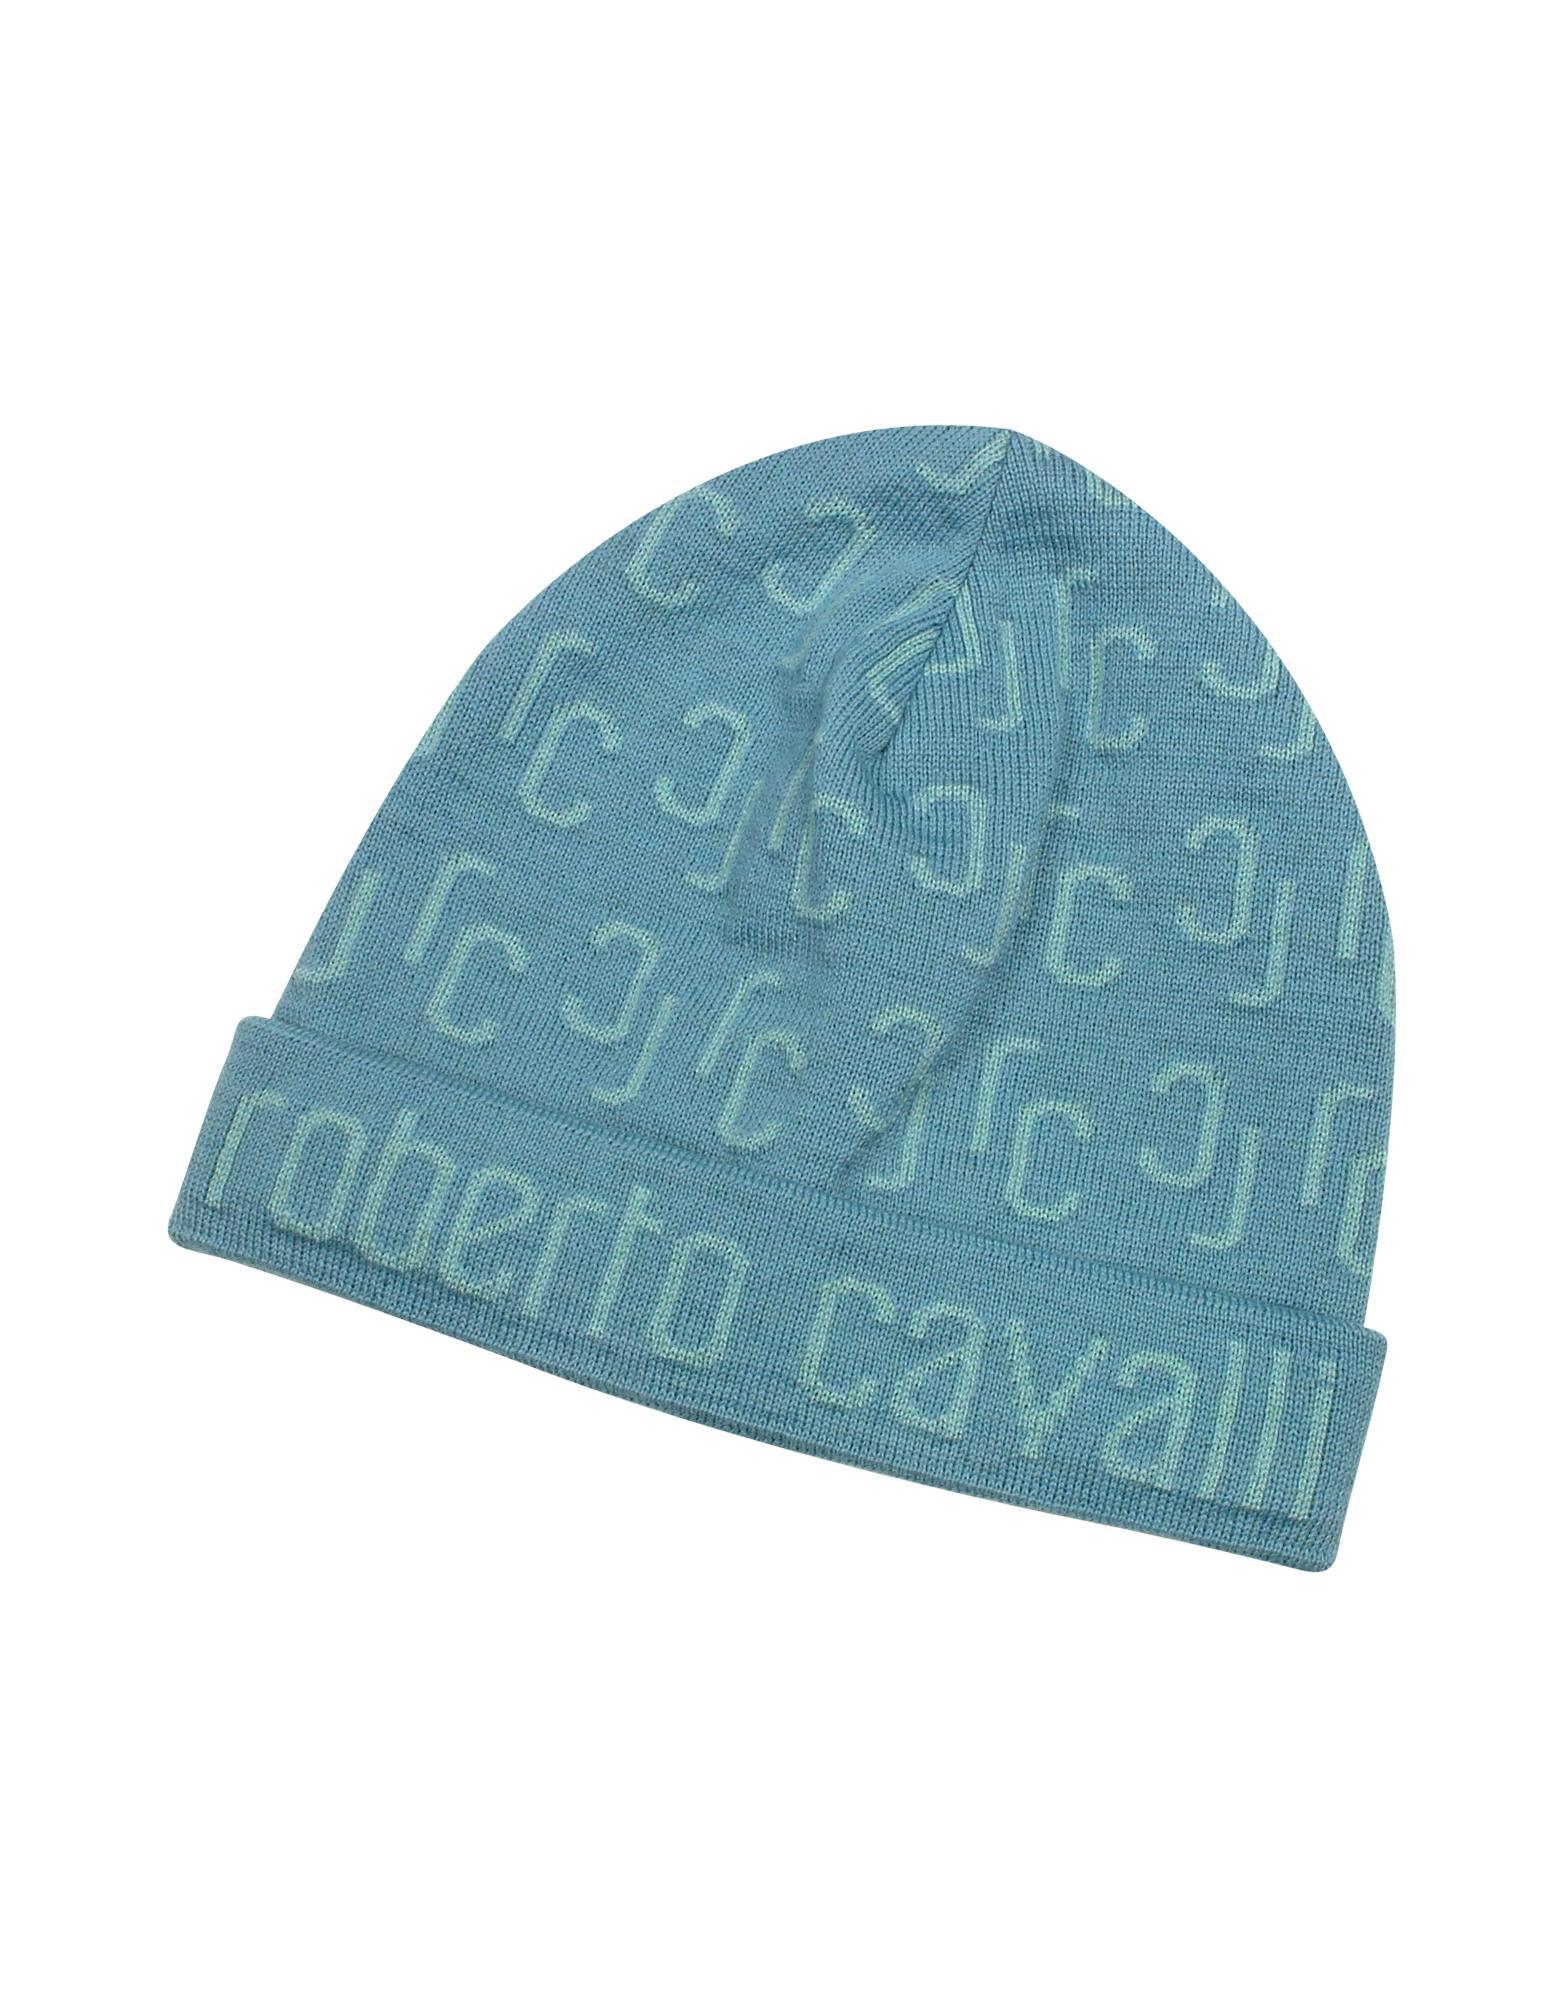 Roberto Cavalli All Over Logo Brim Knit Wool Skull Cap